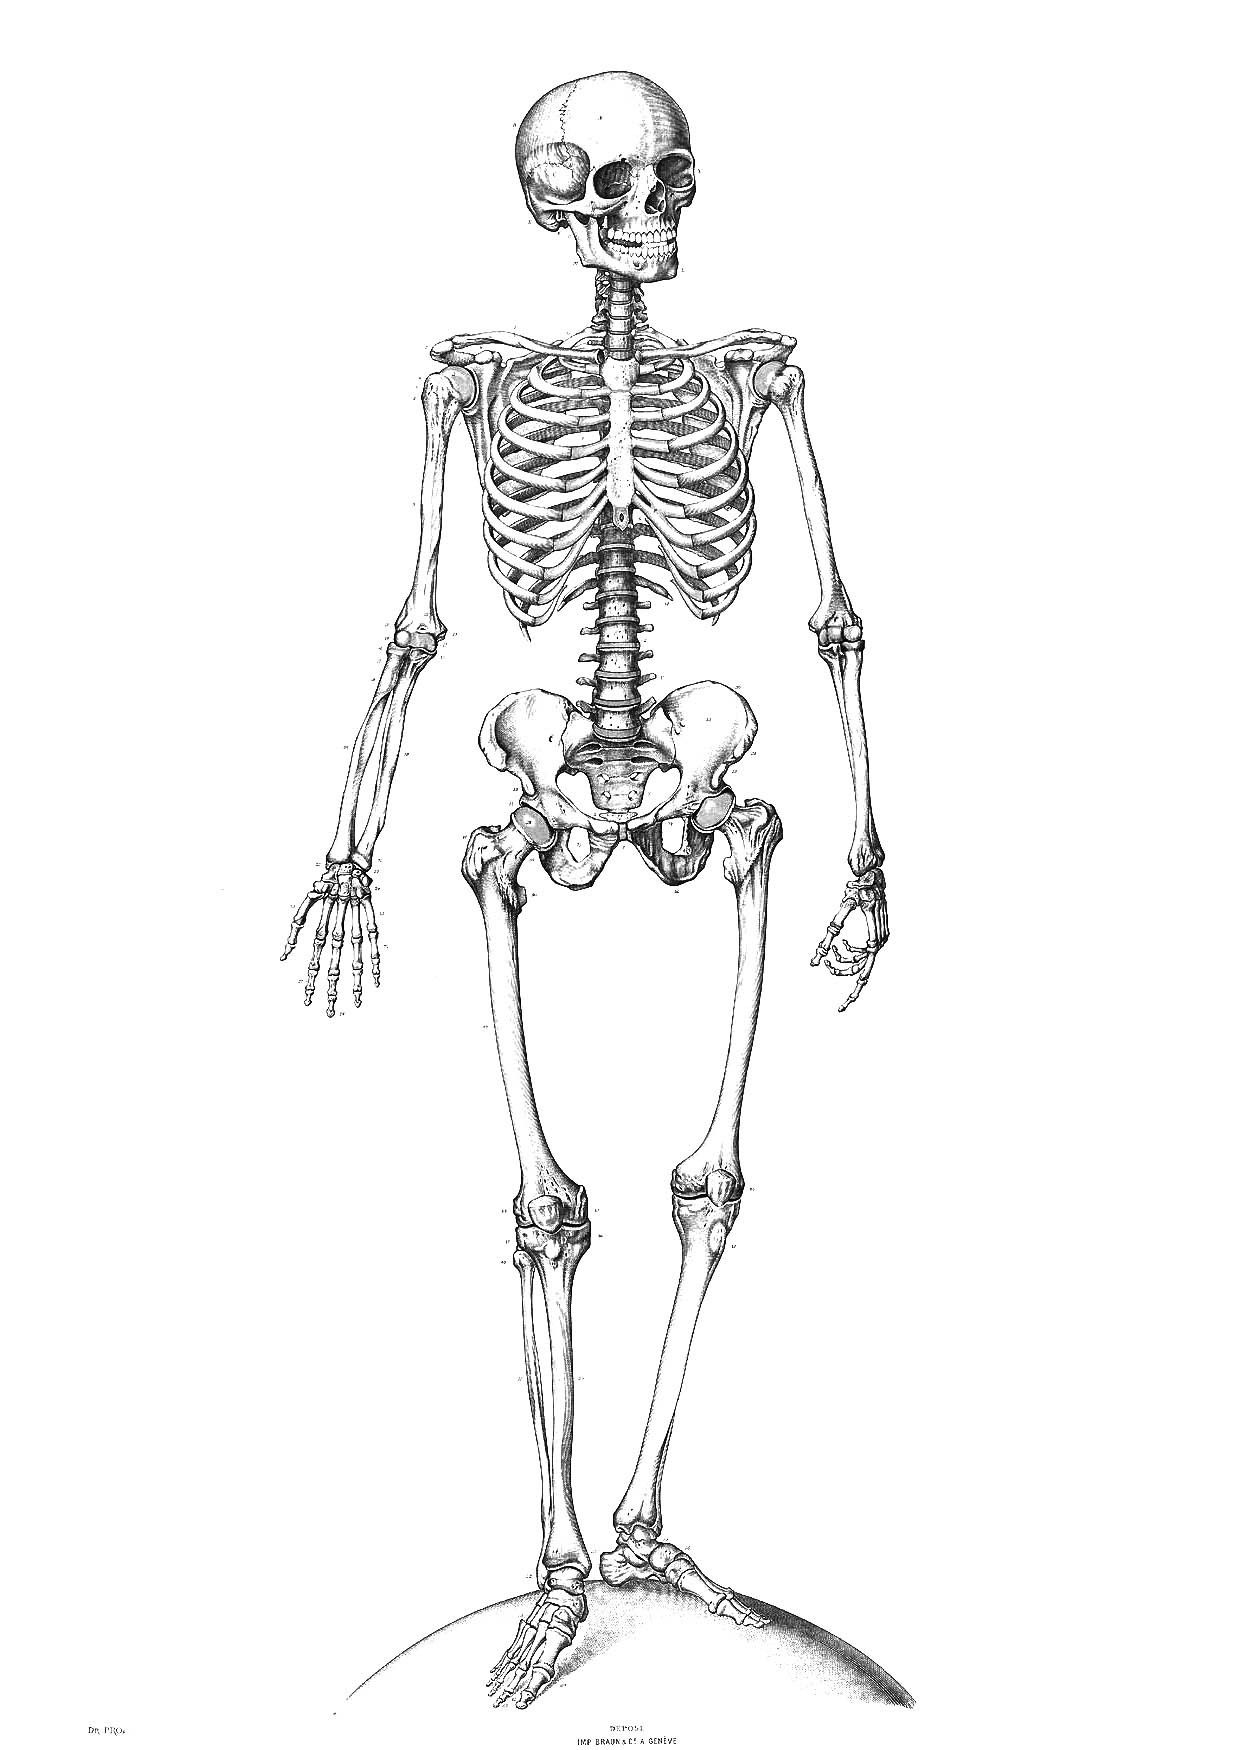 medium resolution of unlabeled human skeleton diagram unlabeled human skeleton diagram blank human skeleton diagram printable human skeleton